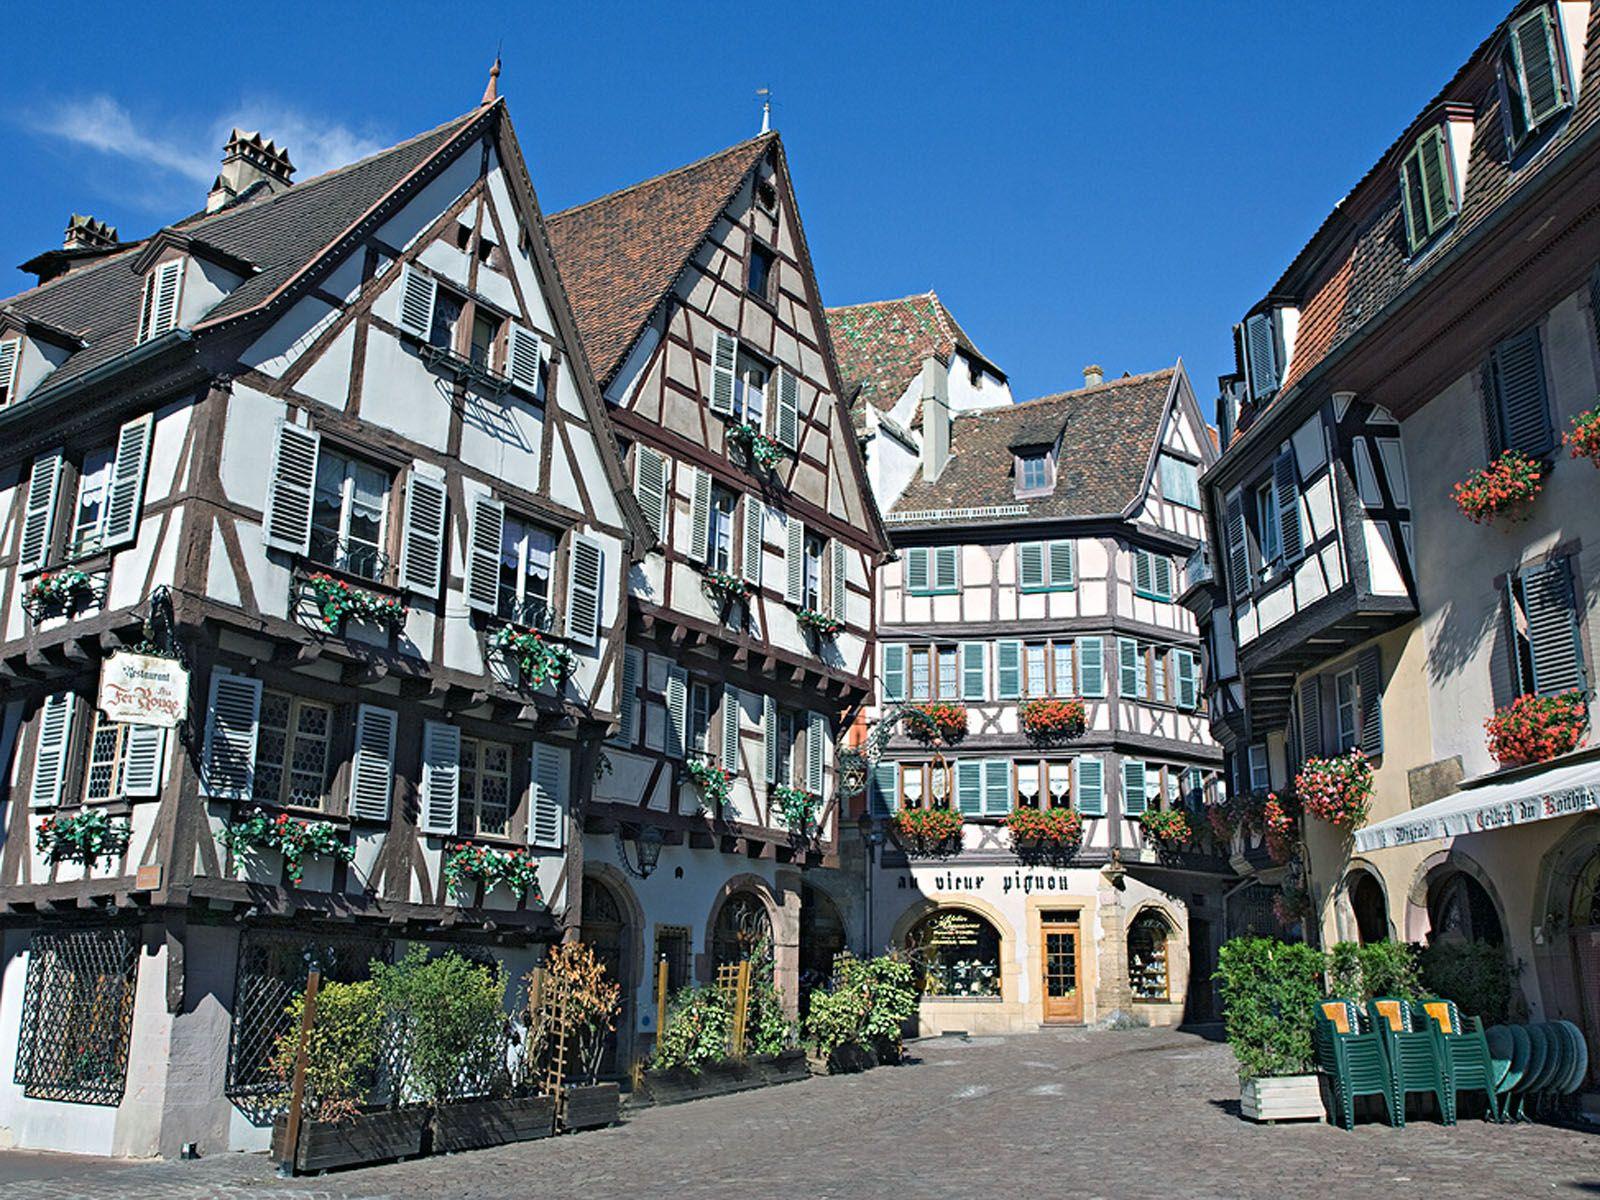 Travel Trip Journey: Colmar, France